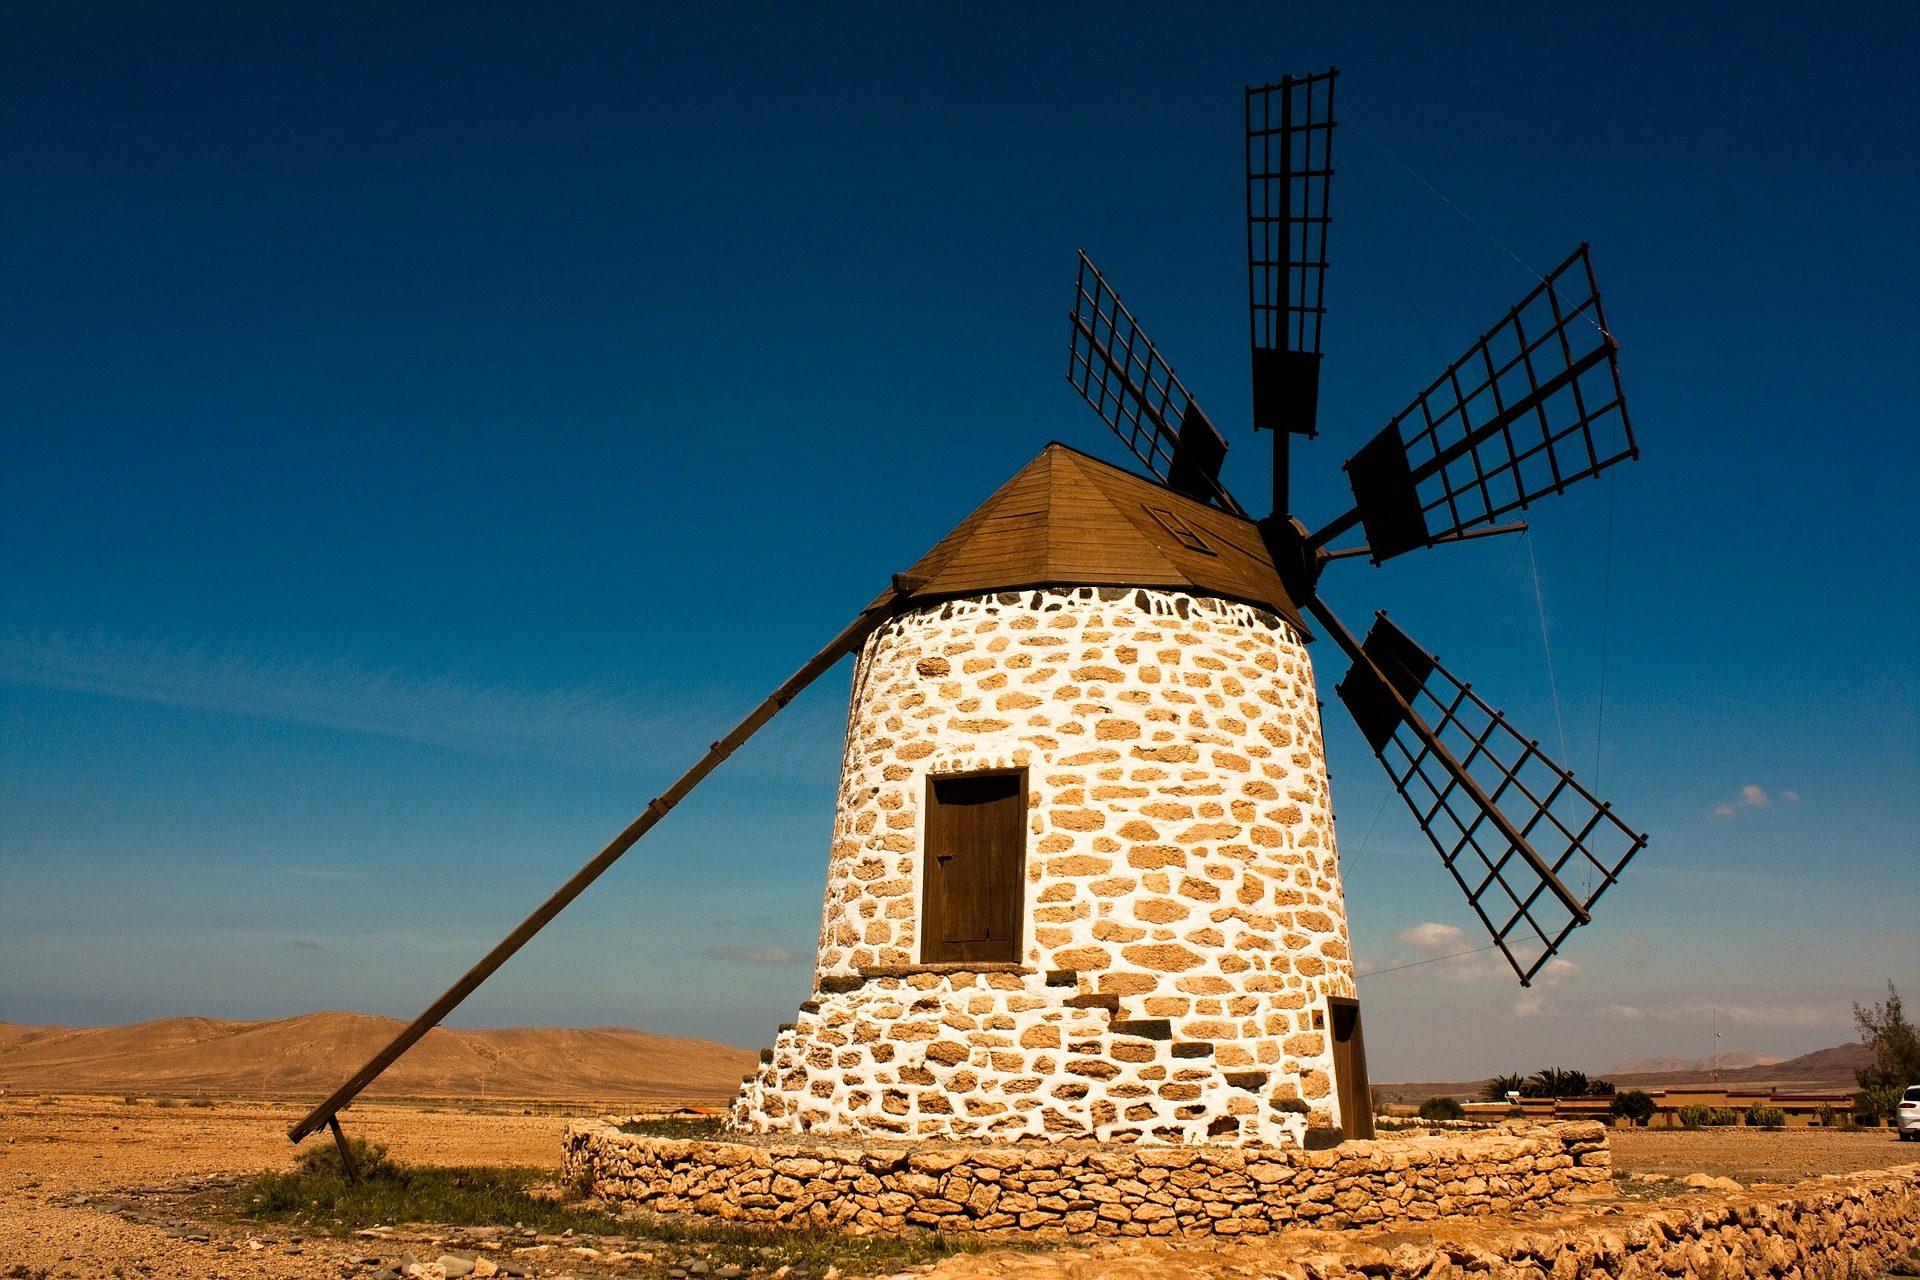 Mühle, Wind, Aspas, Wüste, Plain, Fuerteventura - Wallpaper HD - Prof.-falken.com